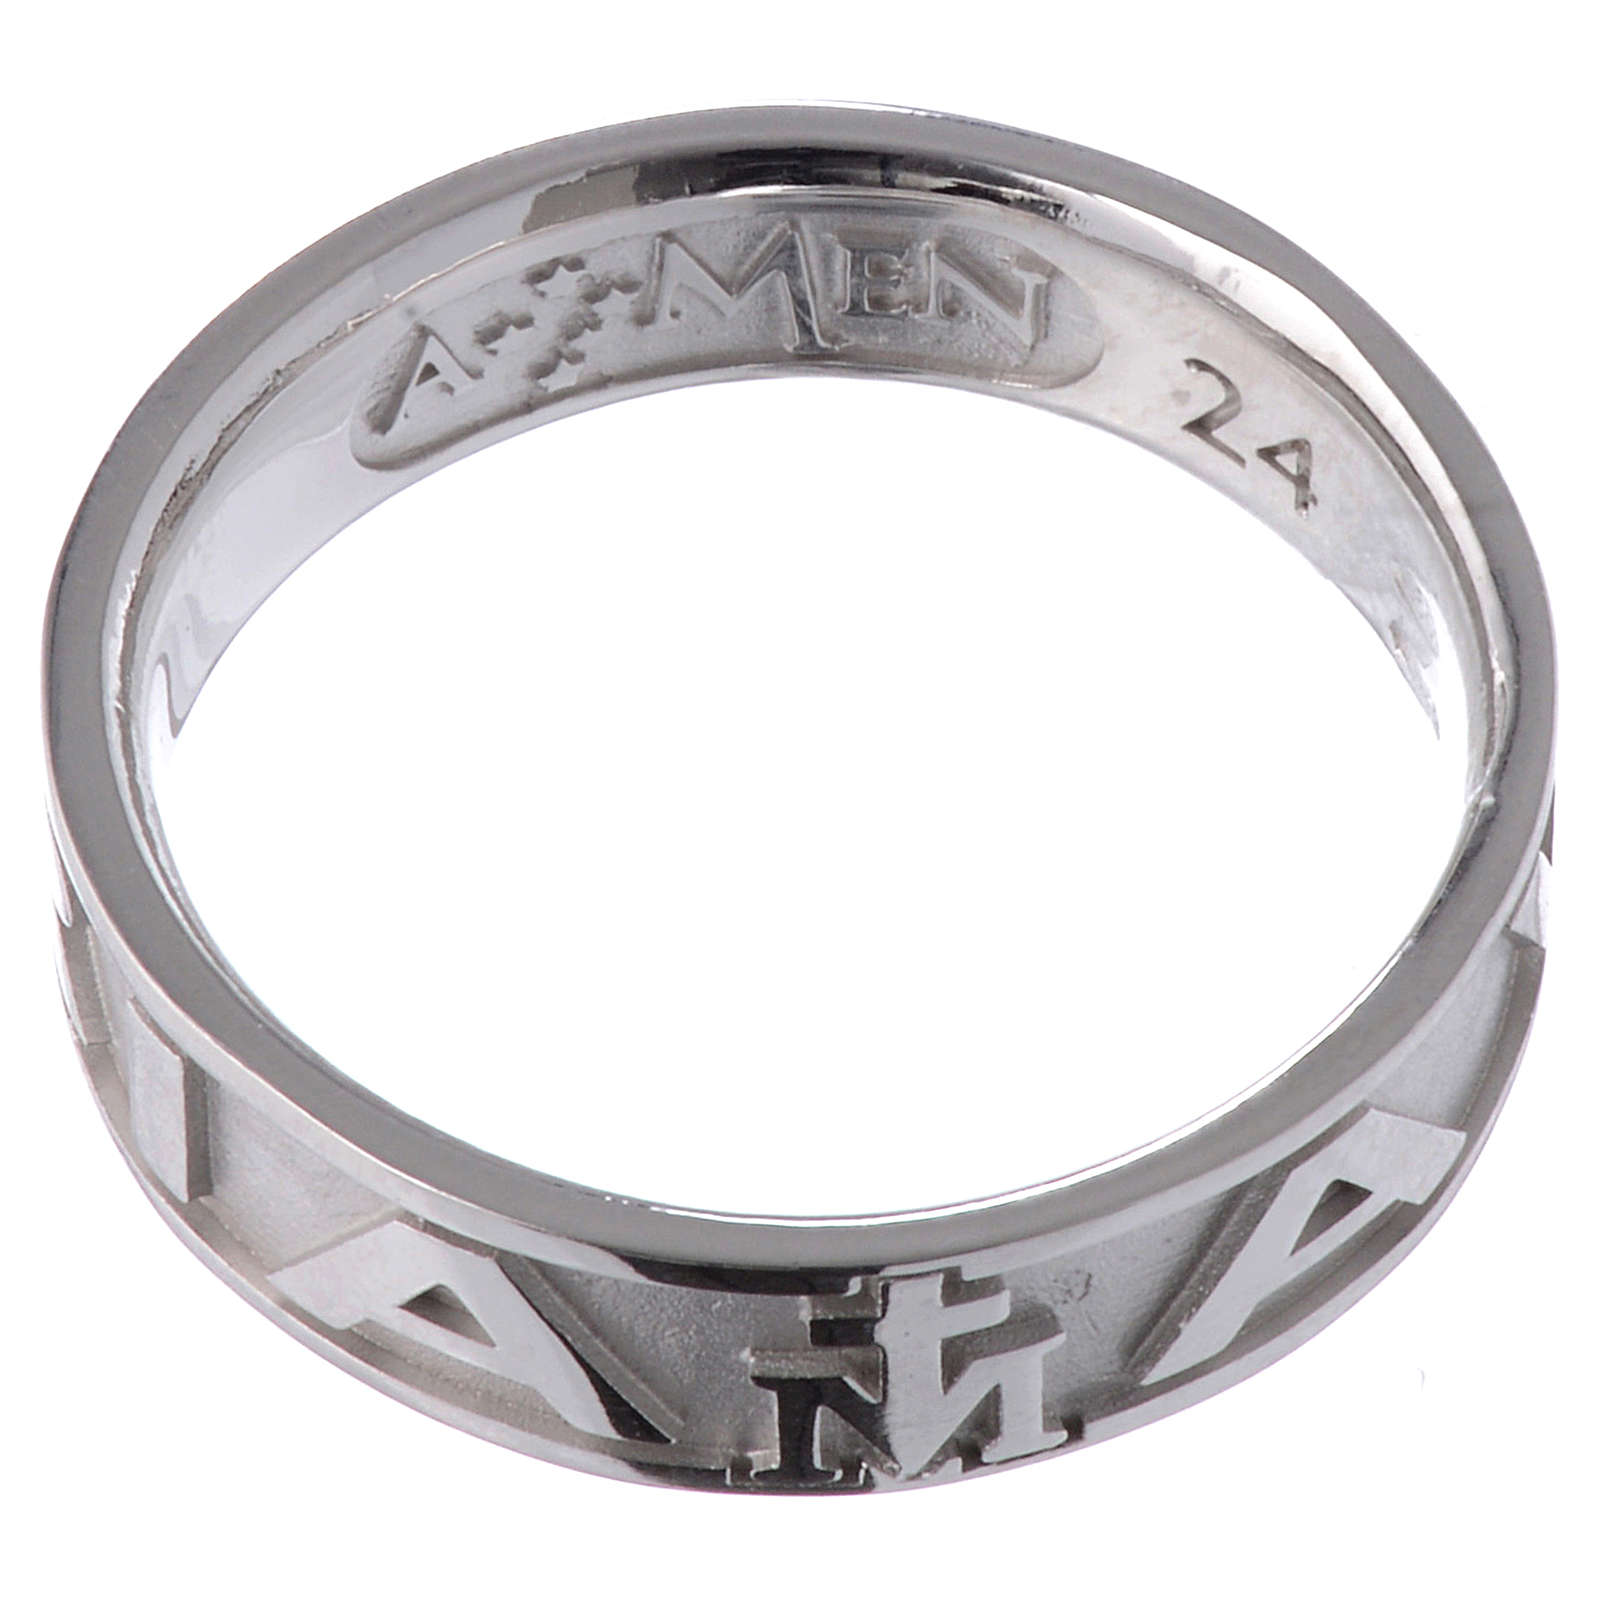 Ring AMEN Hail Mary silver 925, Rhodium finish 3